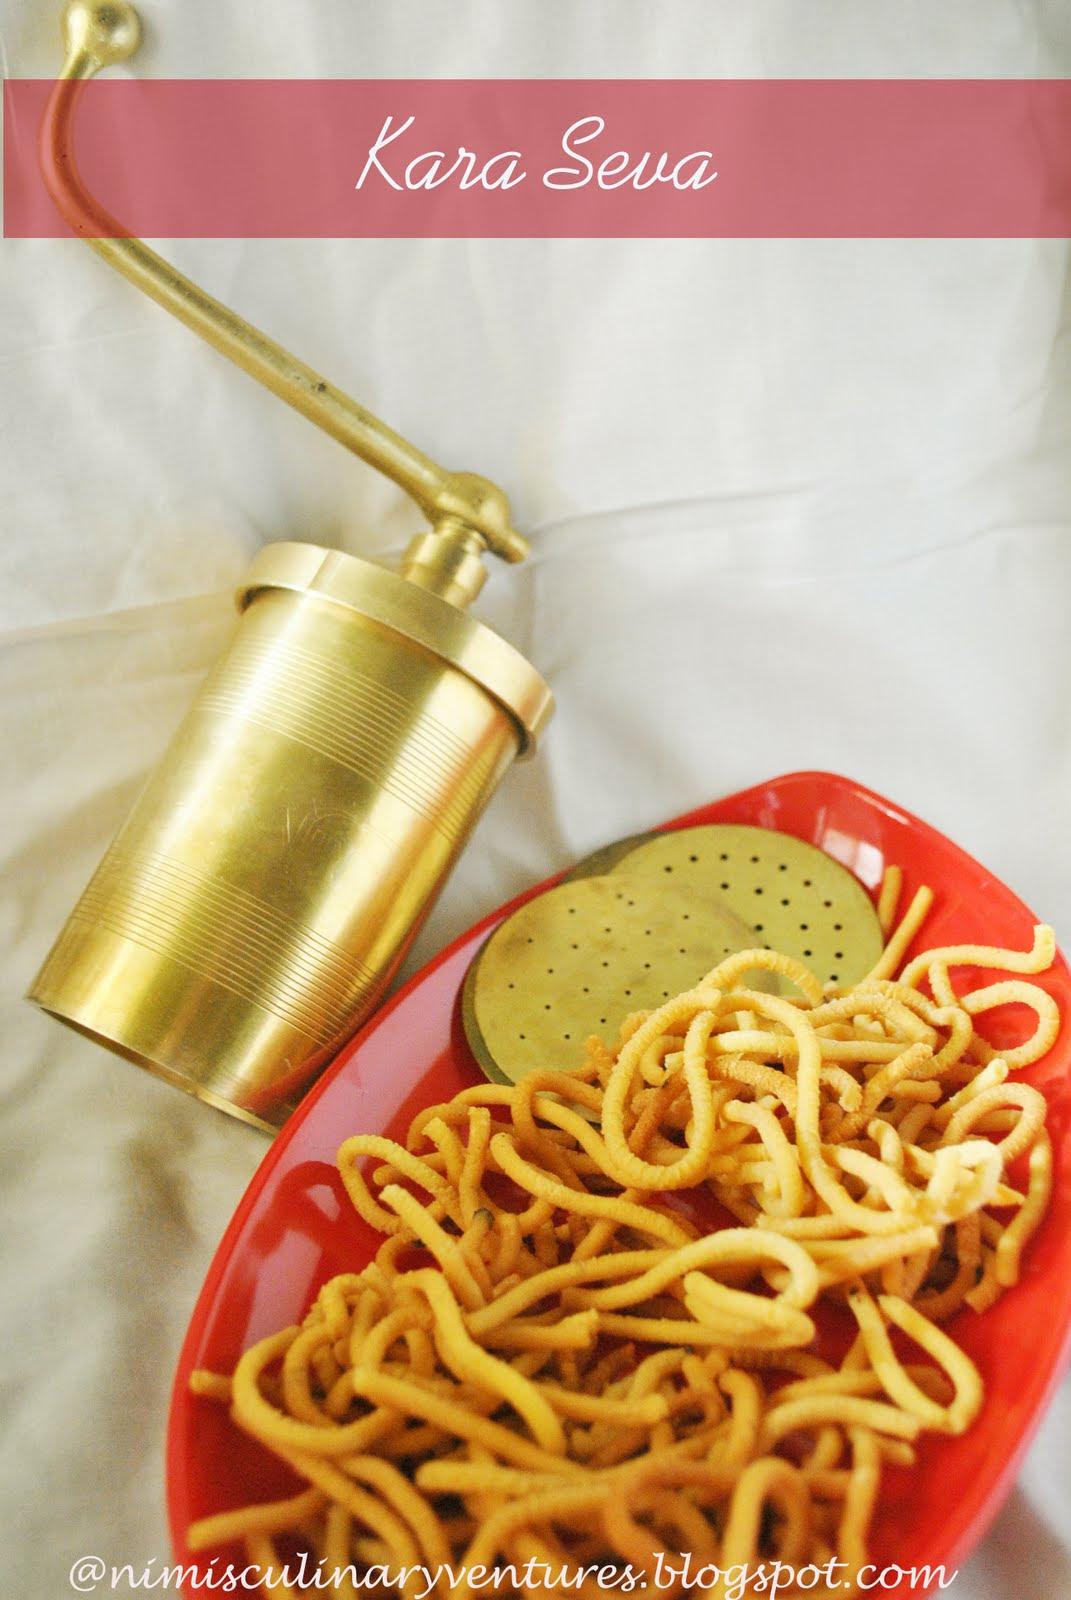 KARA SEVA the crispy noodles!   Nimi's Culinary Ventures